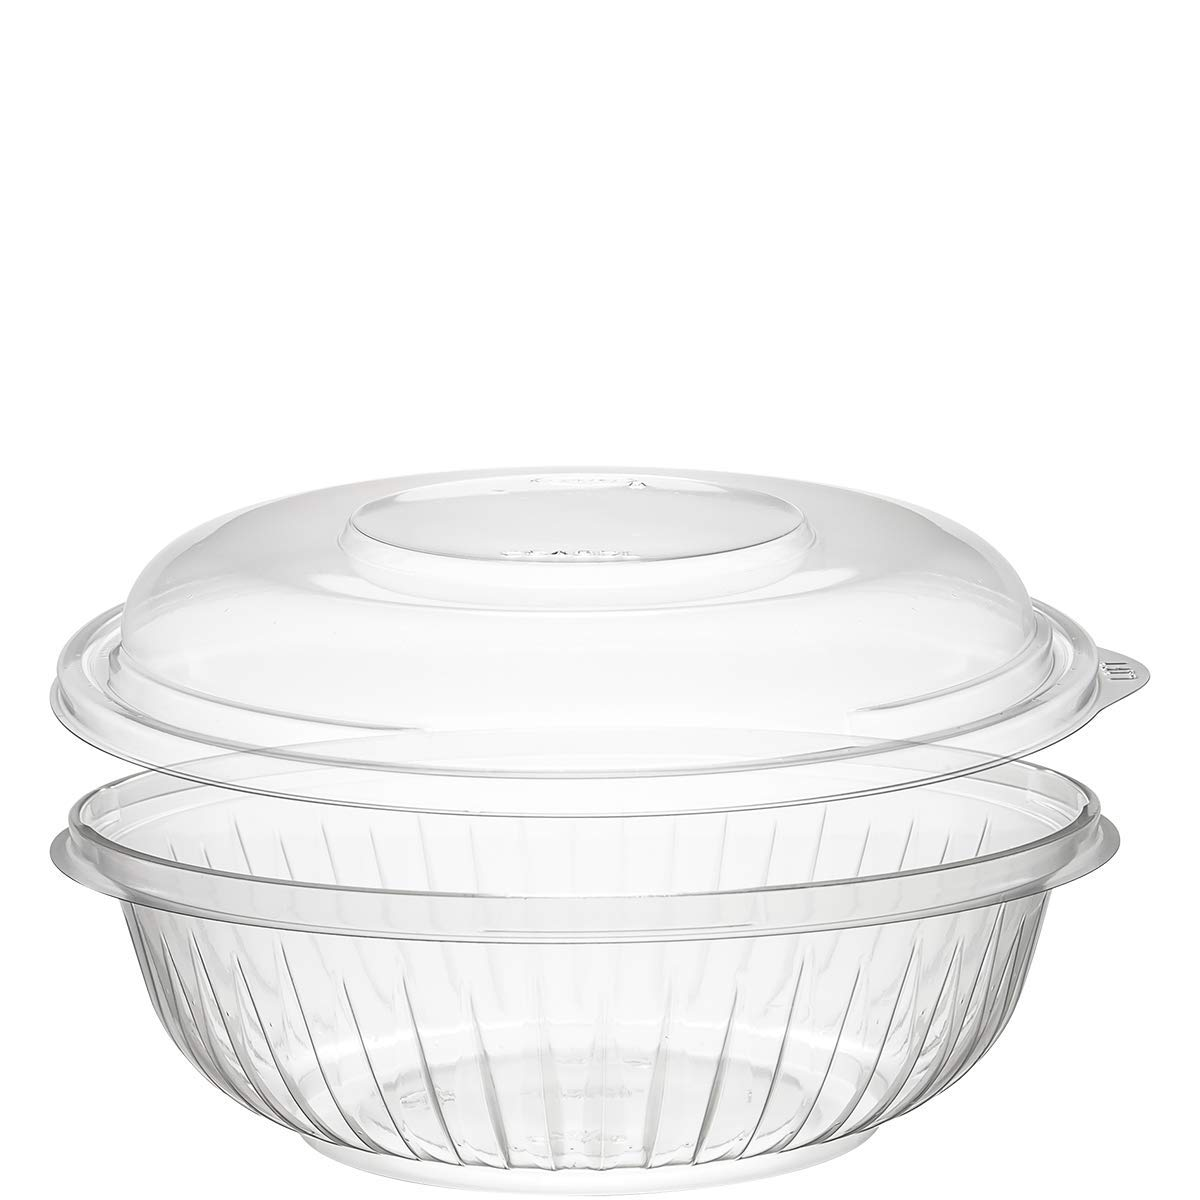 Dart PET24BCD 24 oz Clear PET Bowl with Dome Lid (Case of 126 Bowls w/Lids)